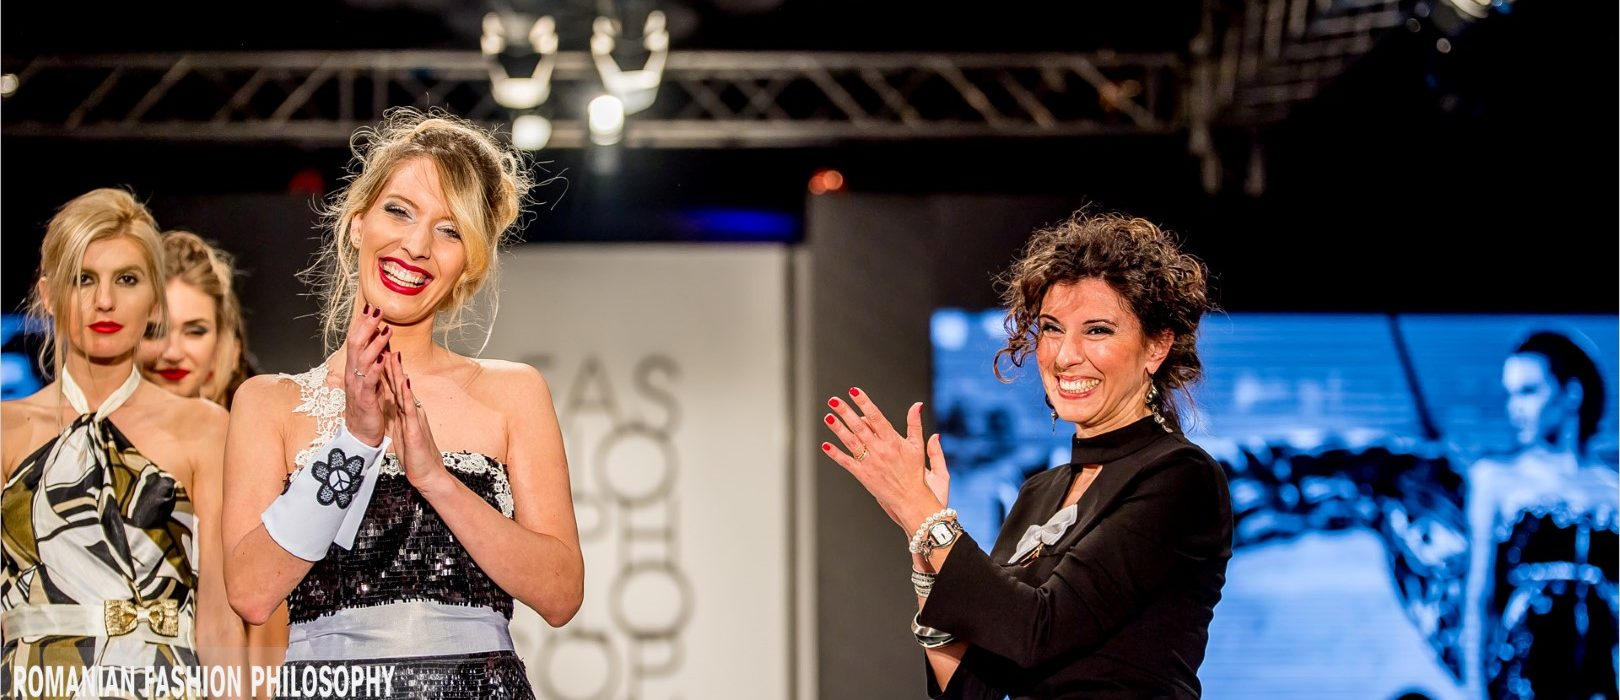 Samanta Russo - Fashion Philosophy